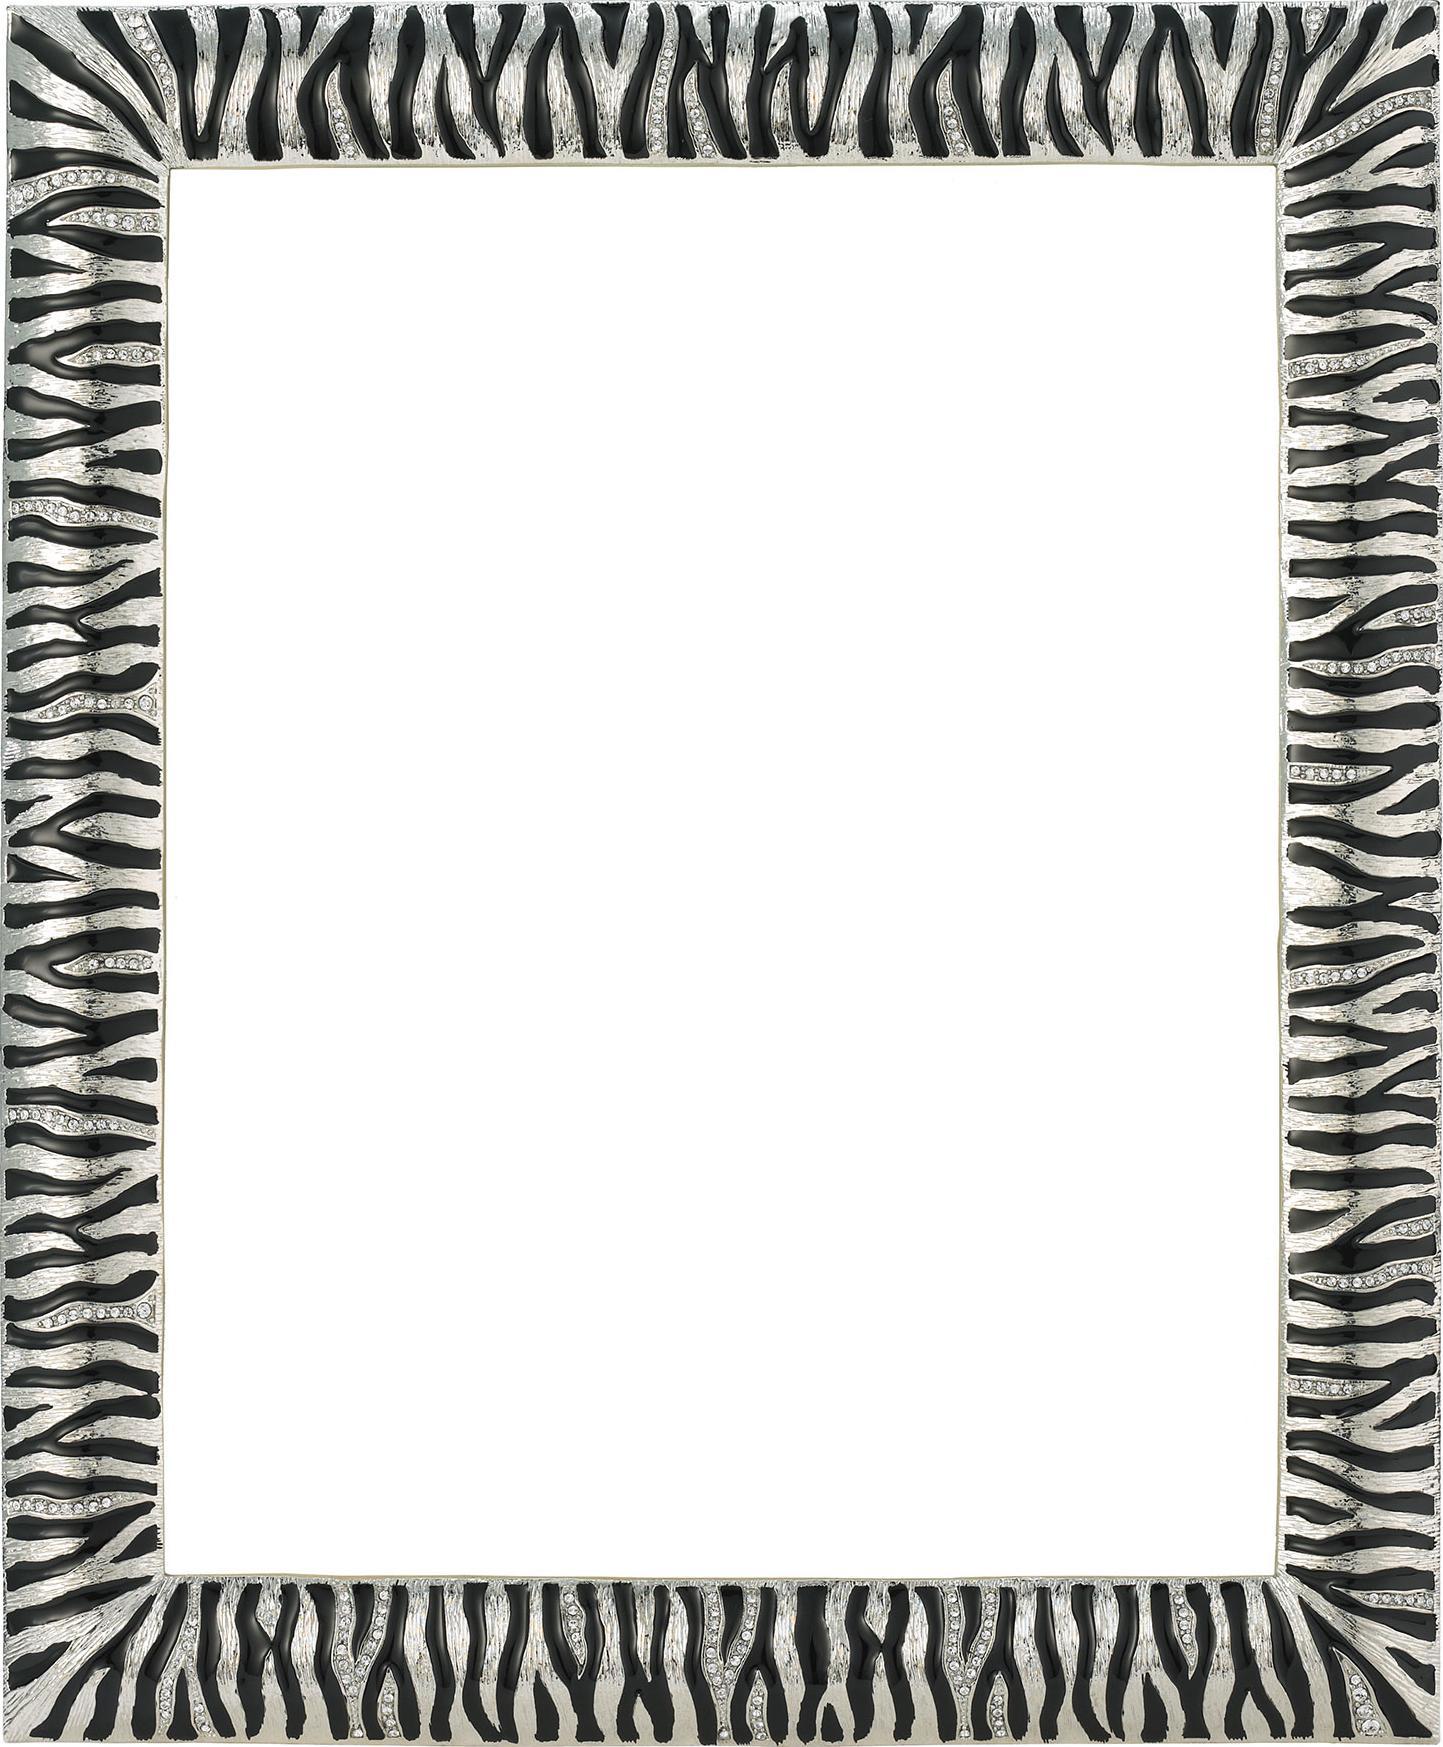 Zebra Frame 8x10 - InteriorDecorating